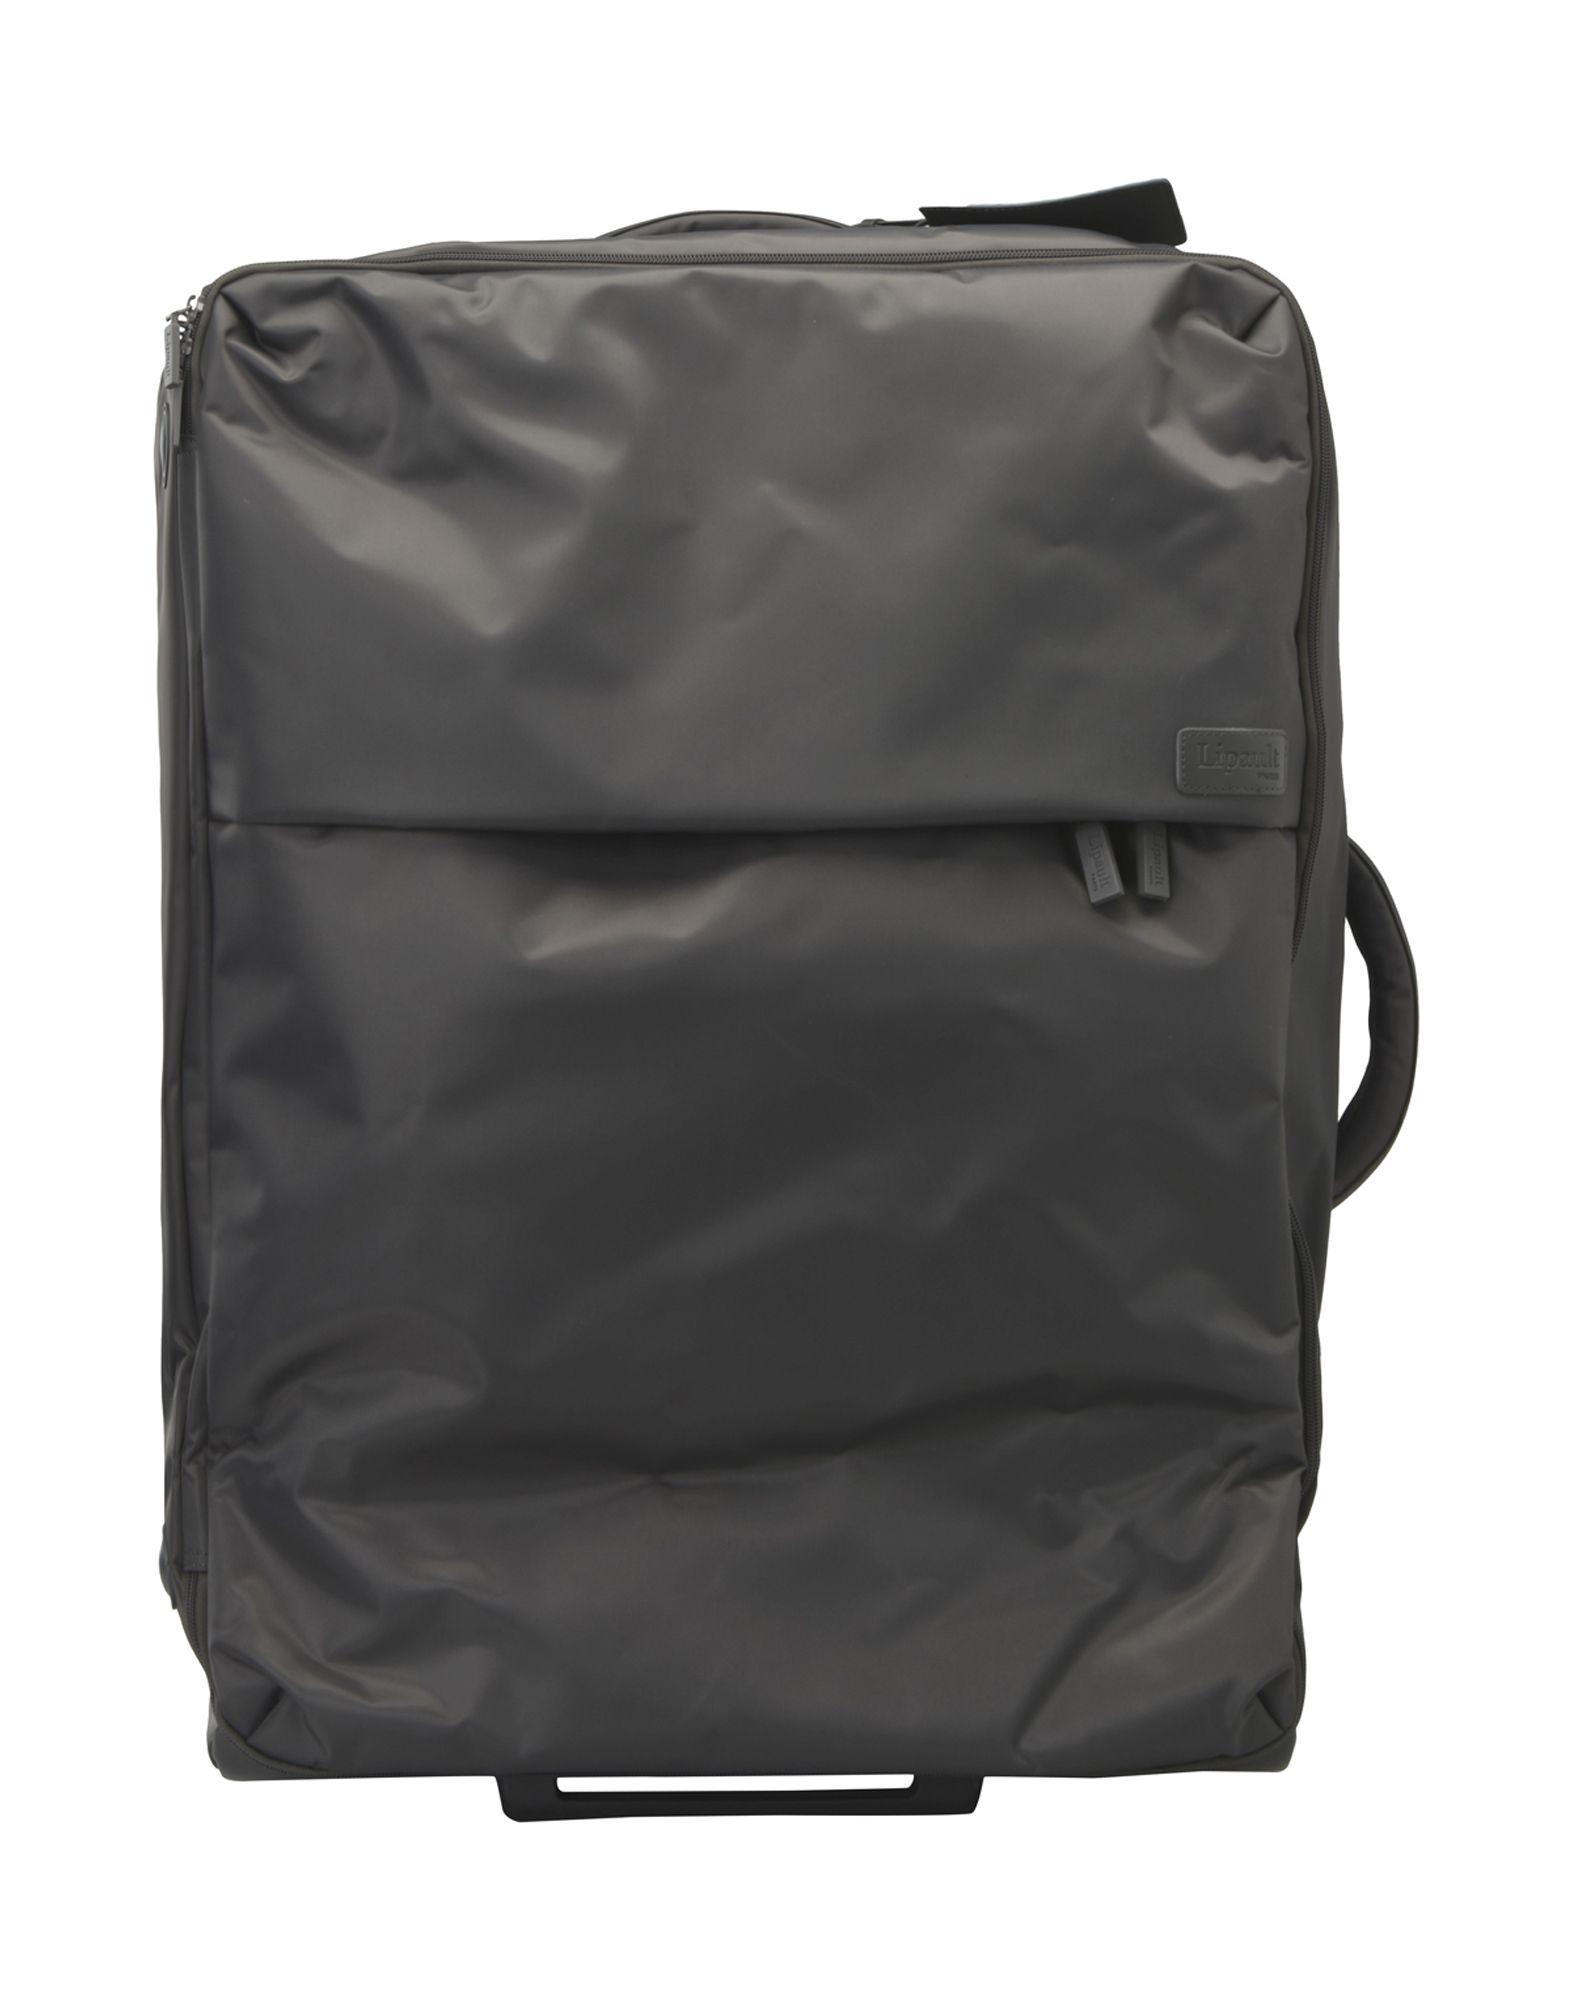 LIPAULT Чемодан/сумка на колесиках lipault дорожная сумка